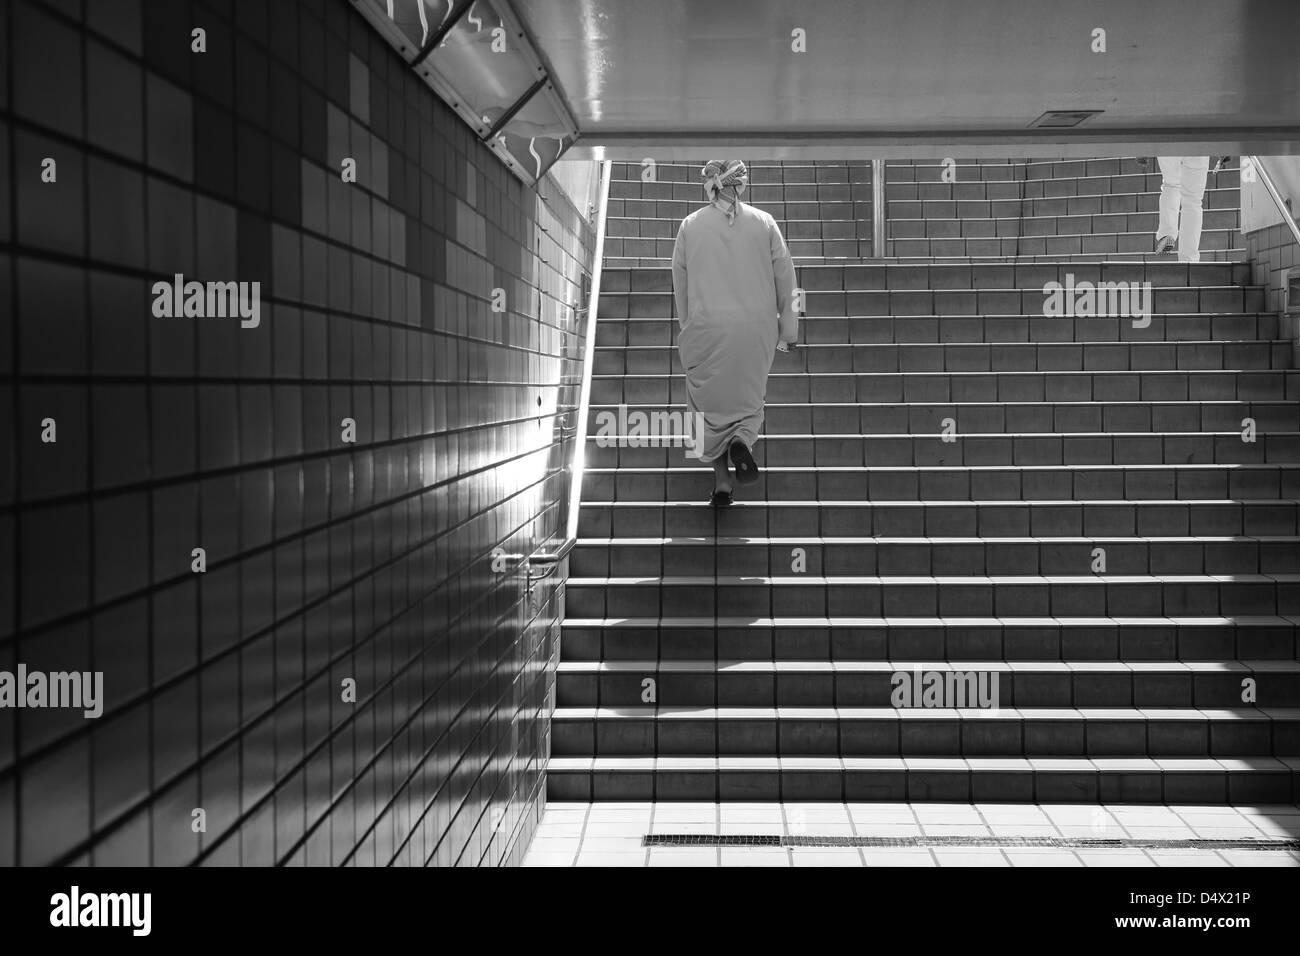 Man walking up stairs from underground walkway, Dubai, United Arab Emirates - Stock Image